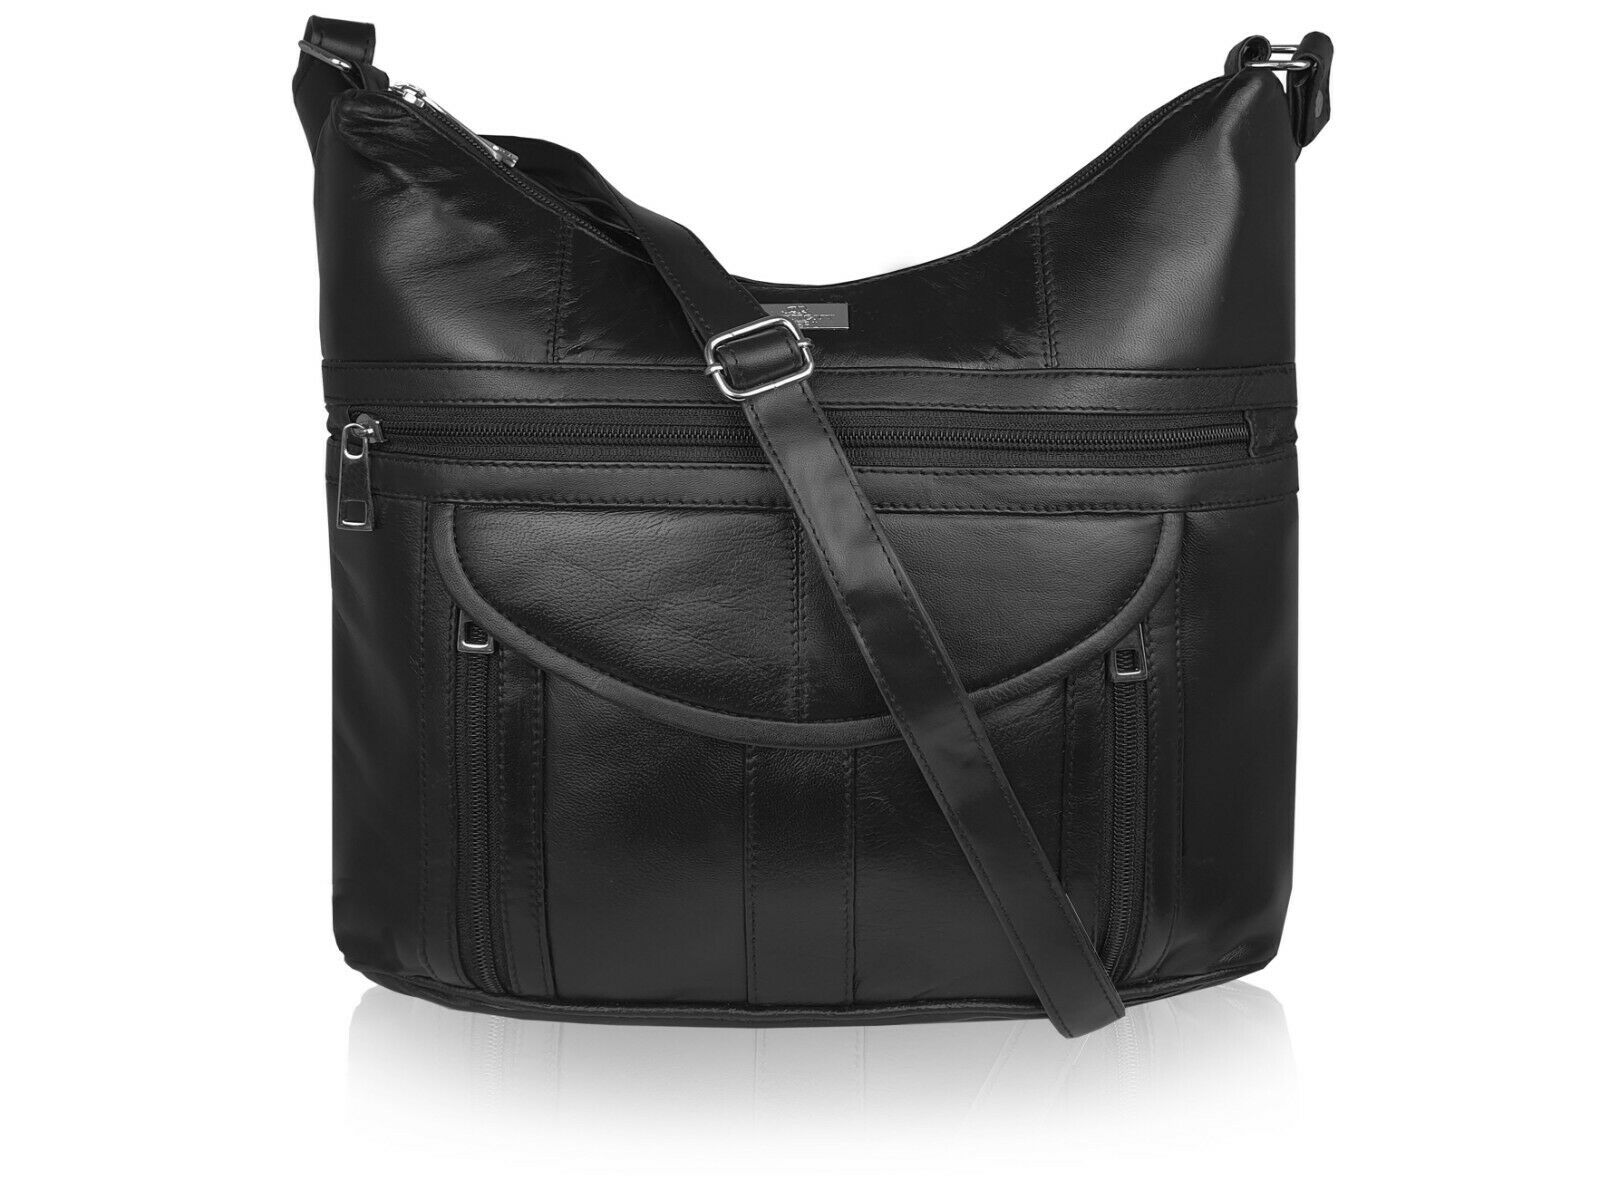 Ladies Soft Leather Black Handbag Single Strap Shoulder Bag Handbags Bags QL176K